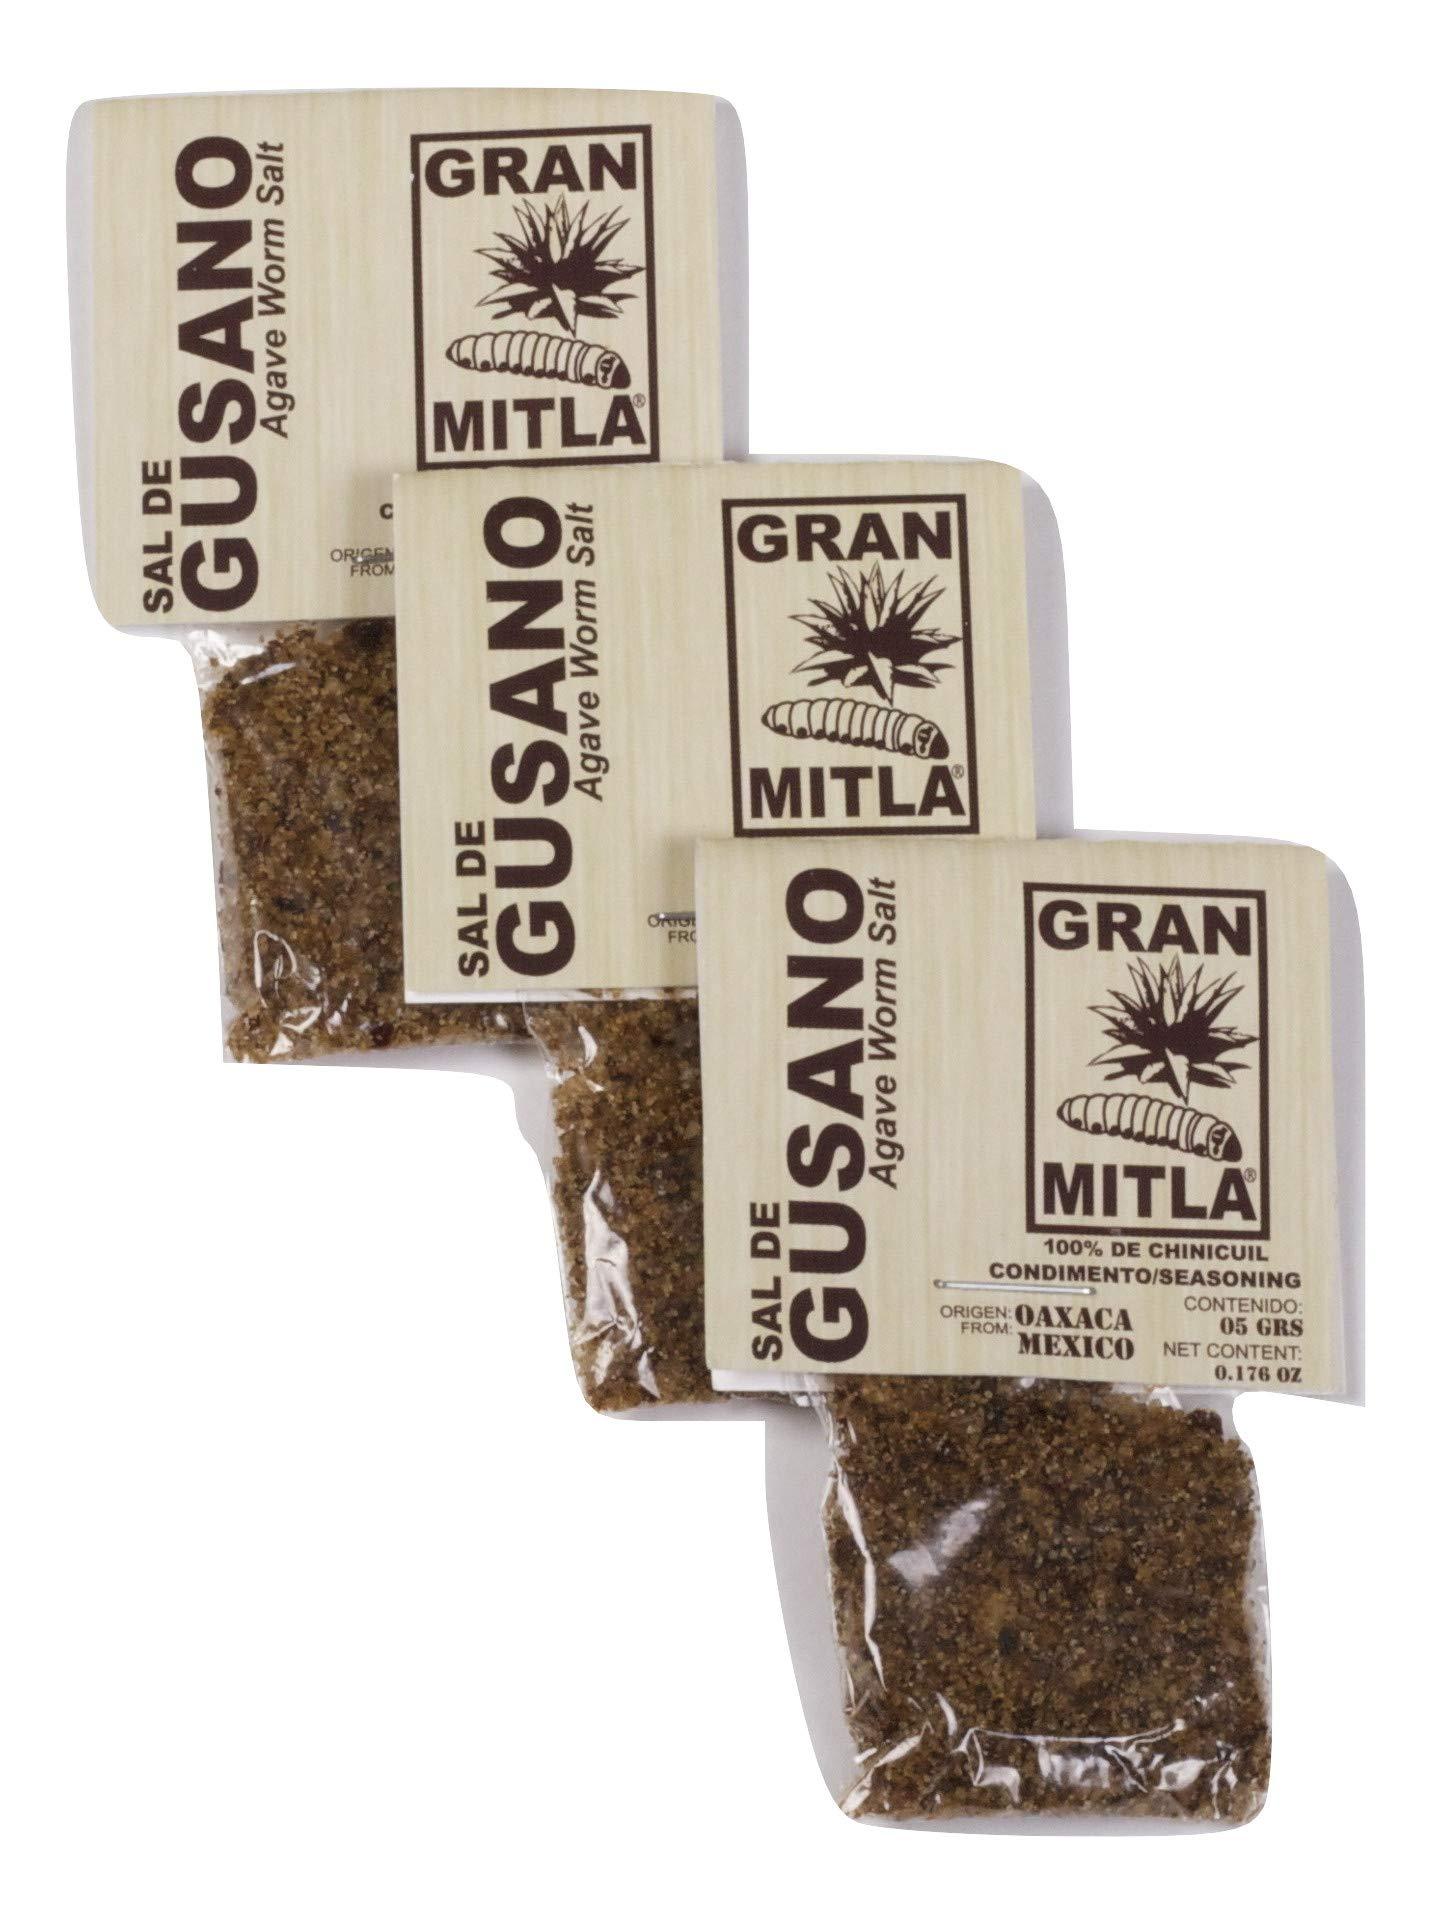 Gran Mitla Sal de Gusano Worm Salt Pack with 50 bags of 5 g each (0.18 oz per bag) (50)